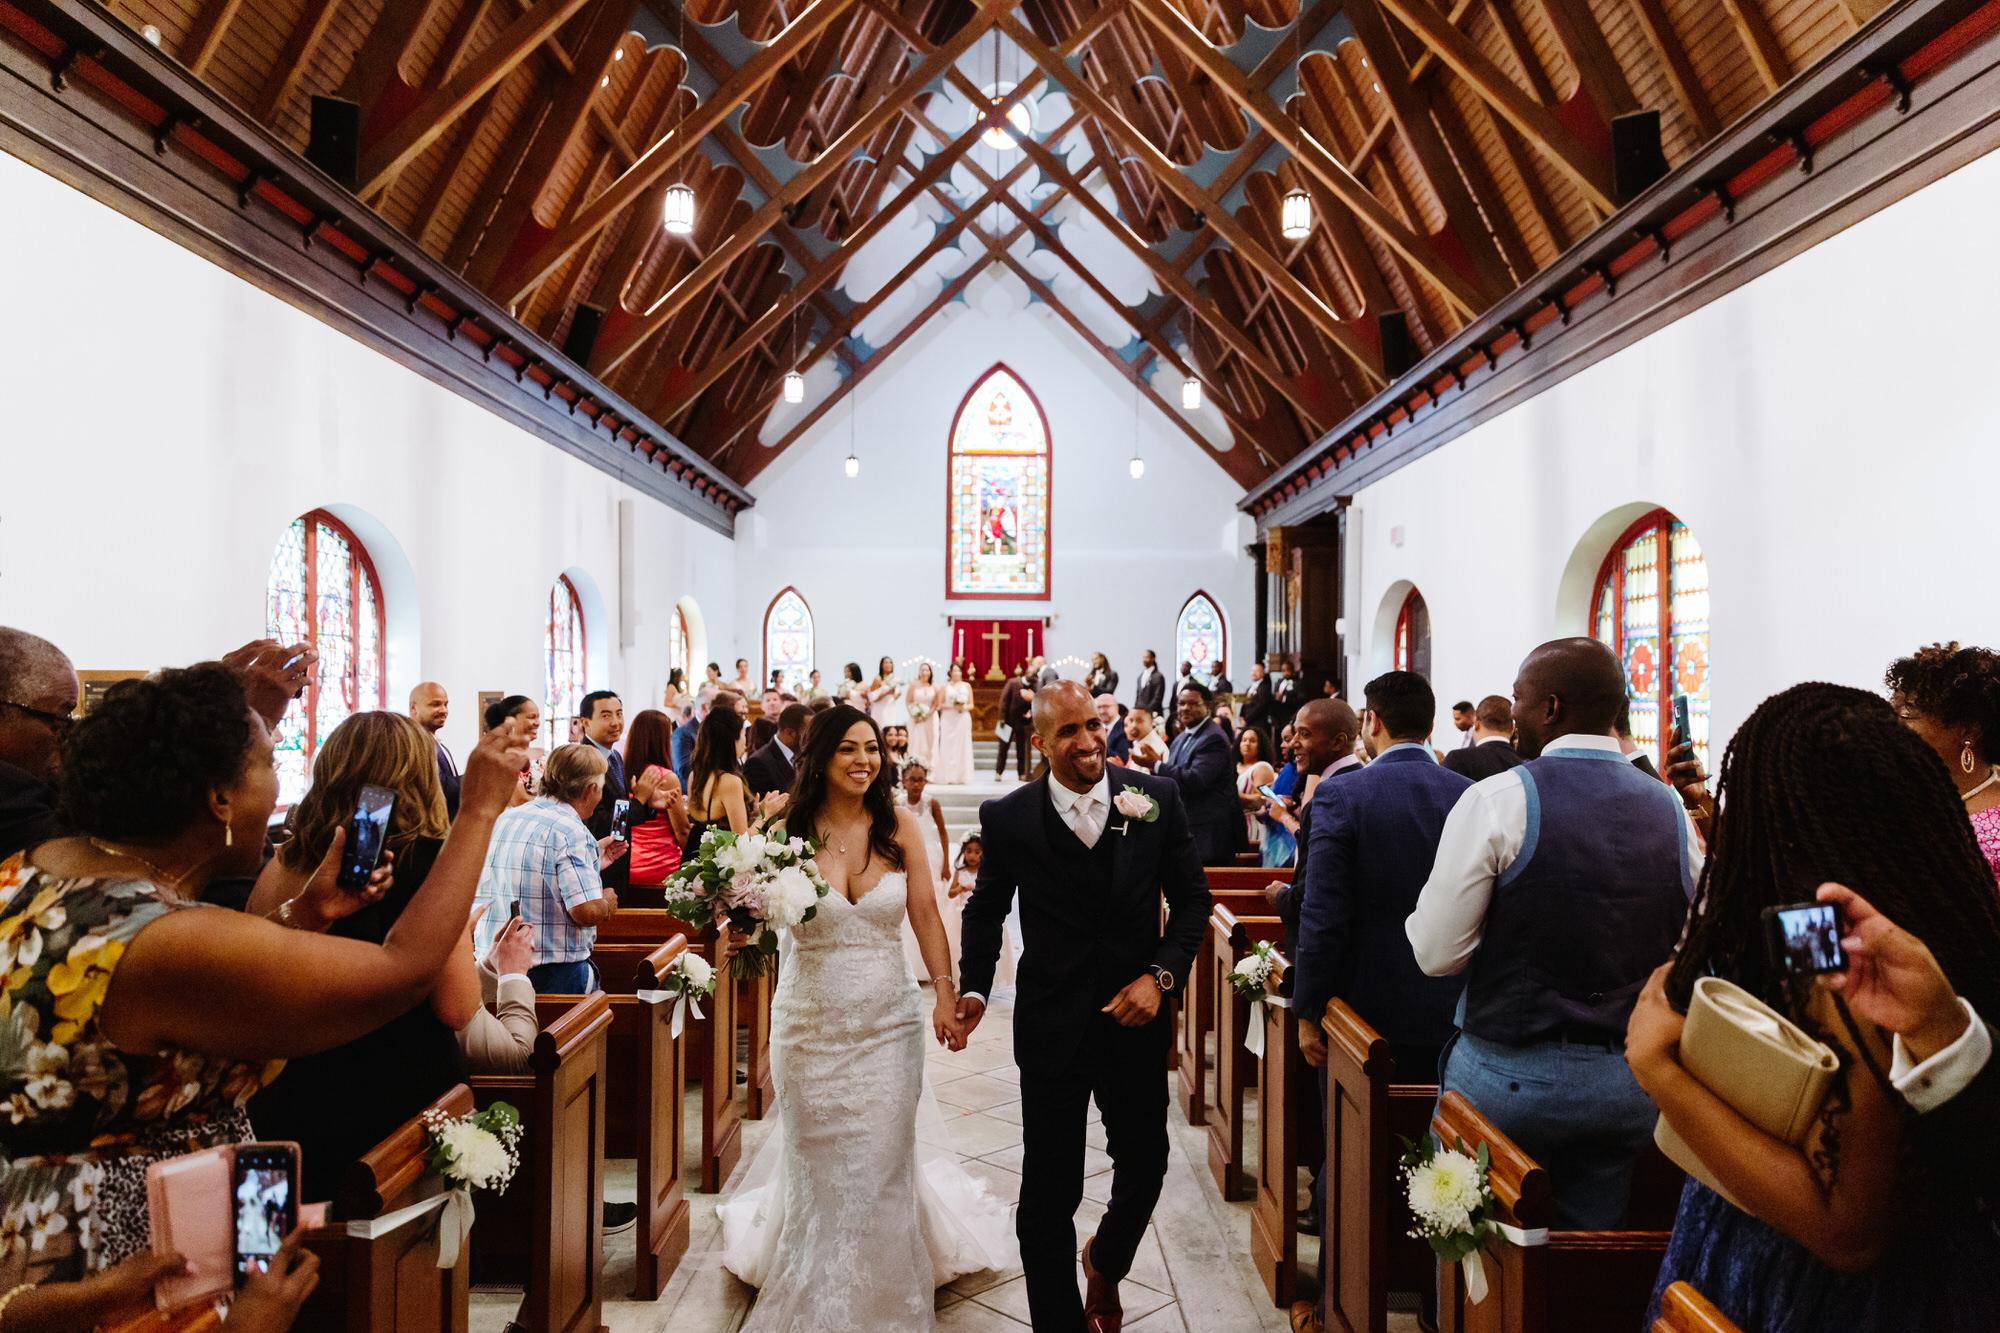 st-lukes-chapel-cannon-green-charleston-wedding-938.JPG